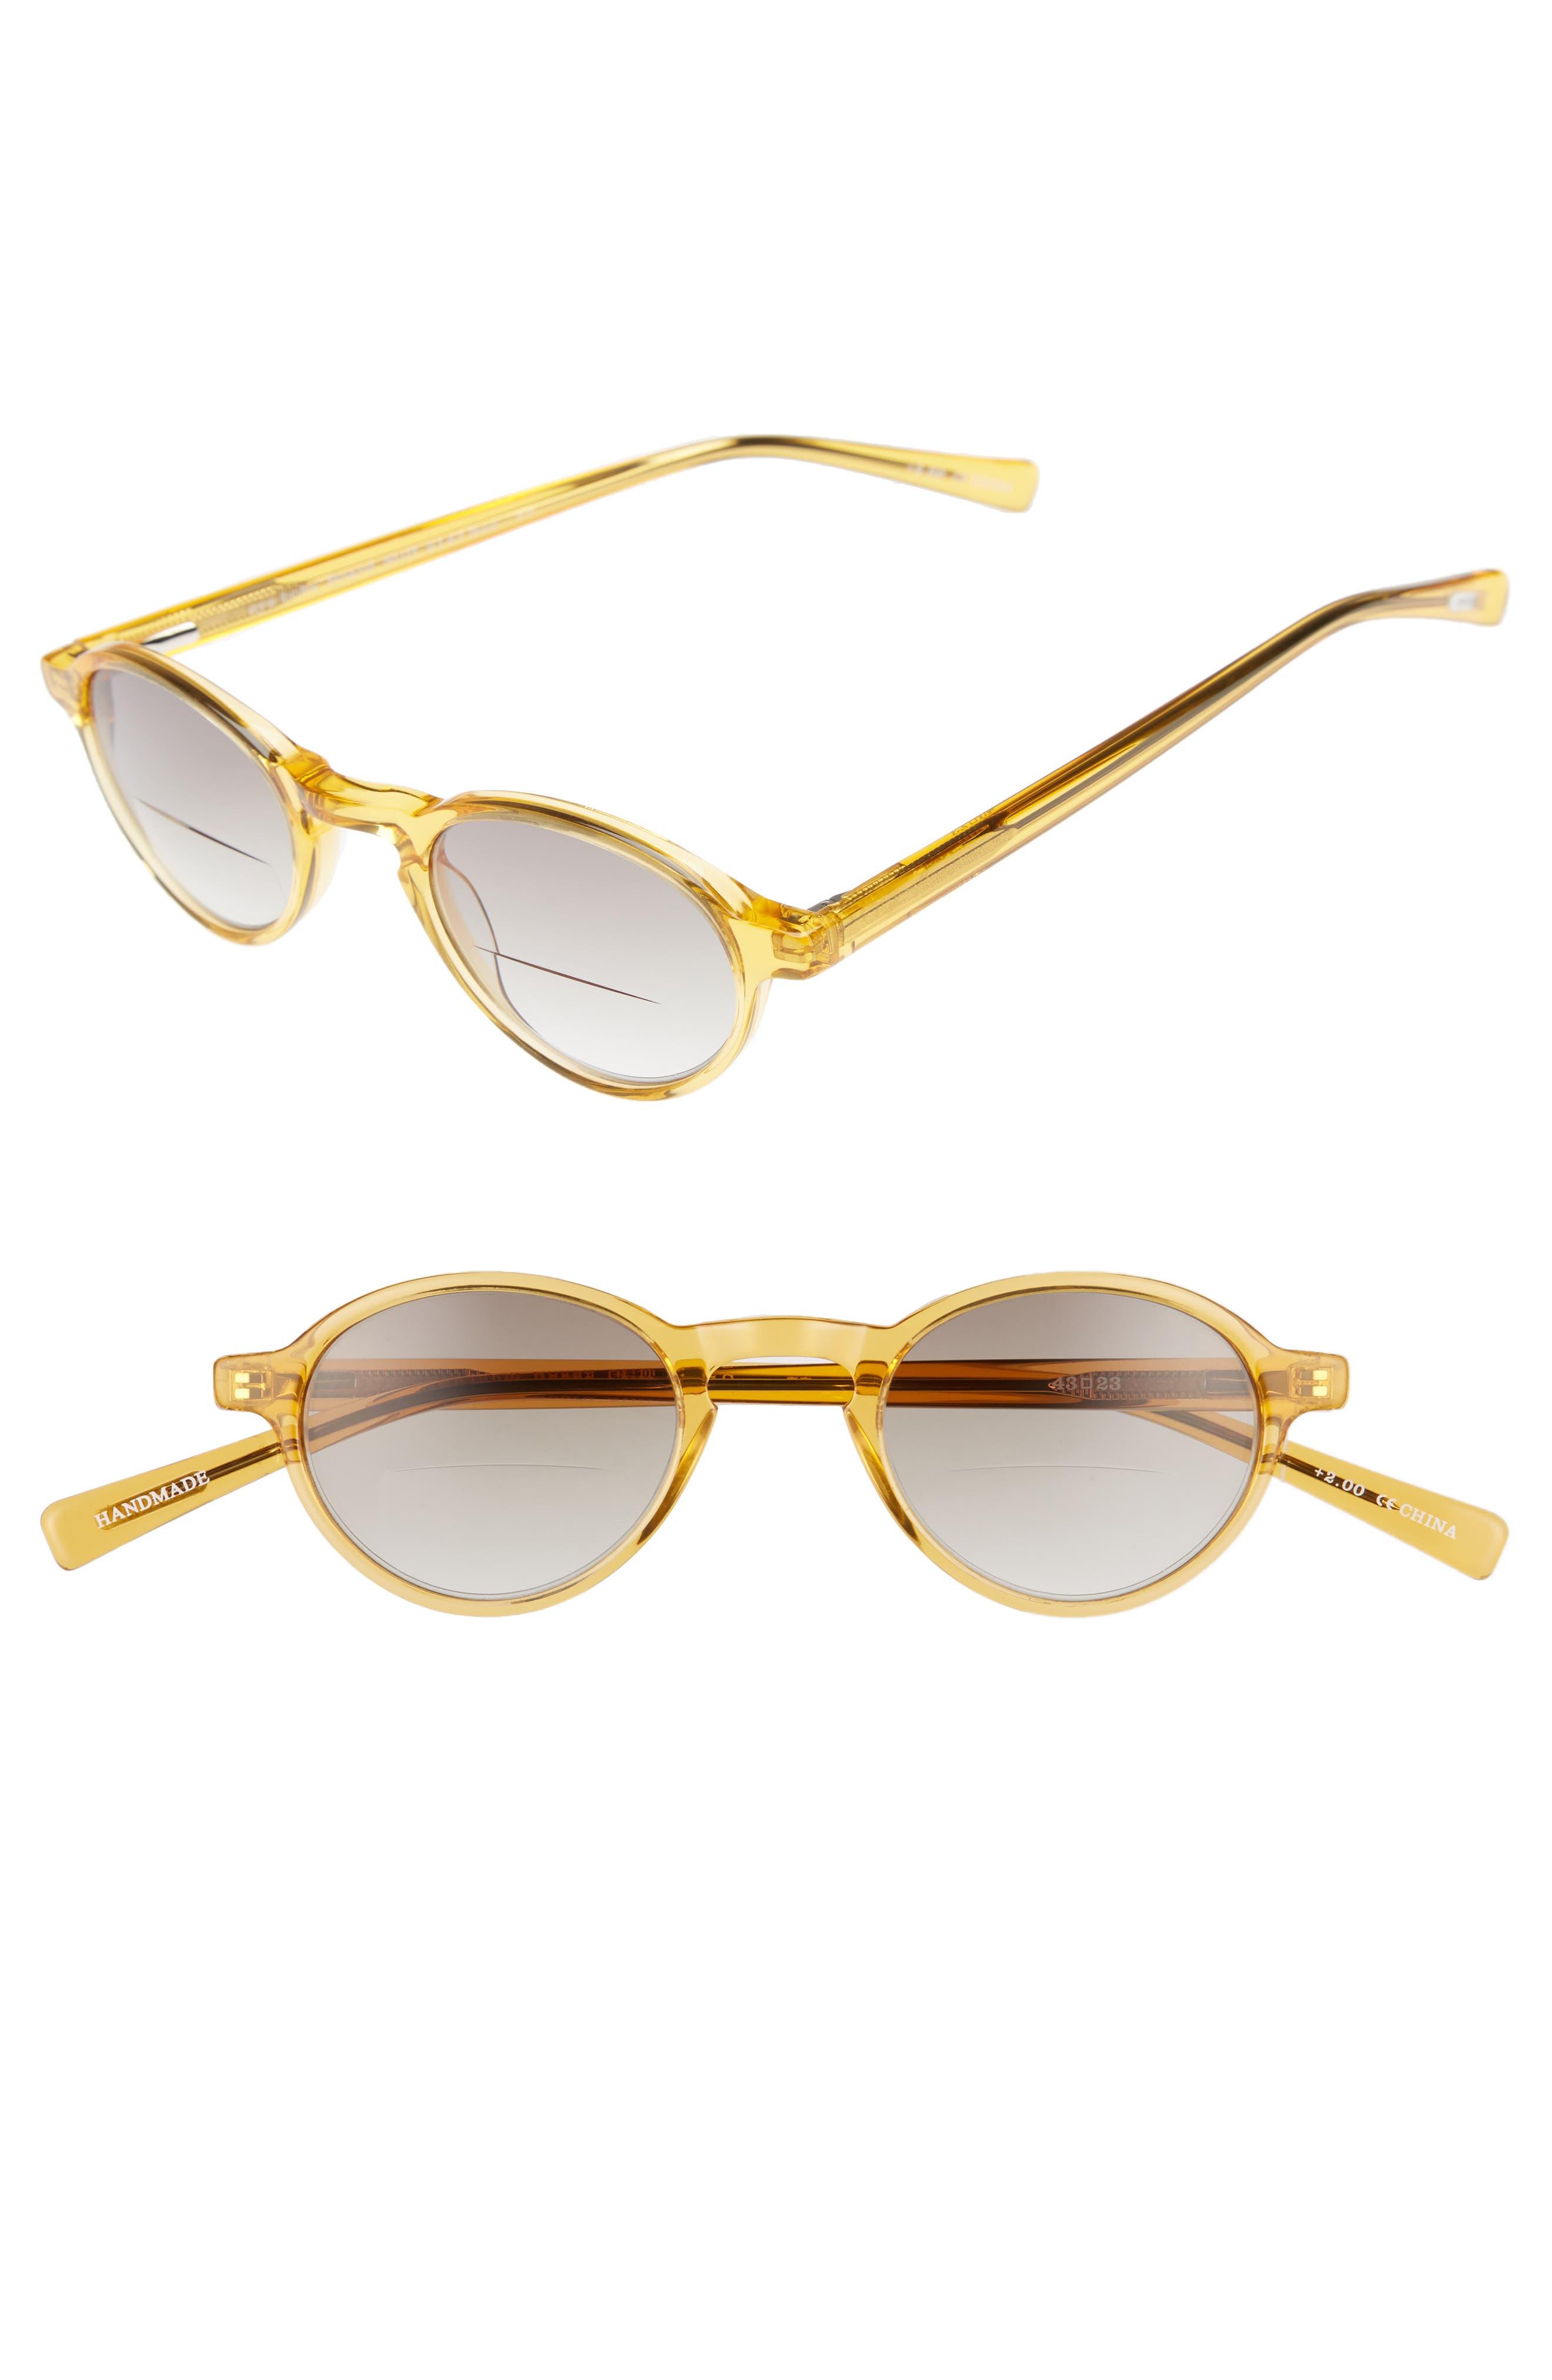 Board Stiff 43mm Reading Sunglasses,                             Main thumbnail 1, color,                             ORANGE CRYSTAL